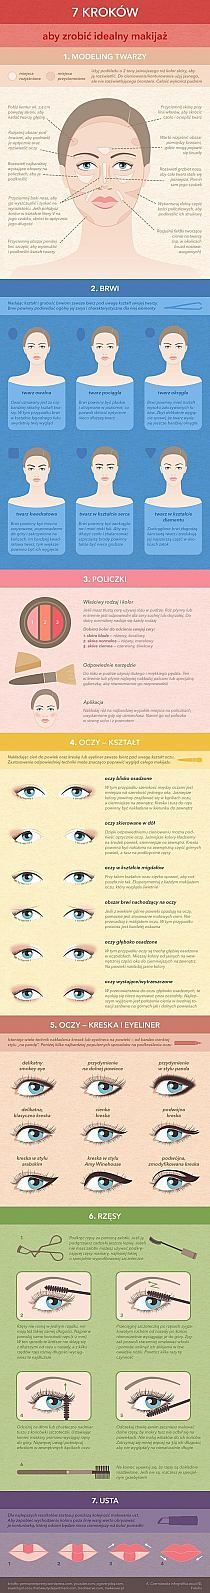 Make-up in a nutshell. Makeup Inspo, Makeup Inspiration, Beauty Makeup, Eye Makeup, Prom Makeup, Make Up Tricks, How To Make, Lipstick Tutorial, Essential Oils For Skin